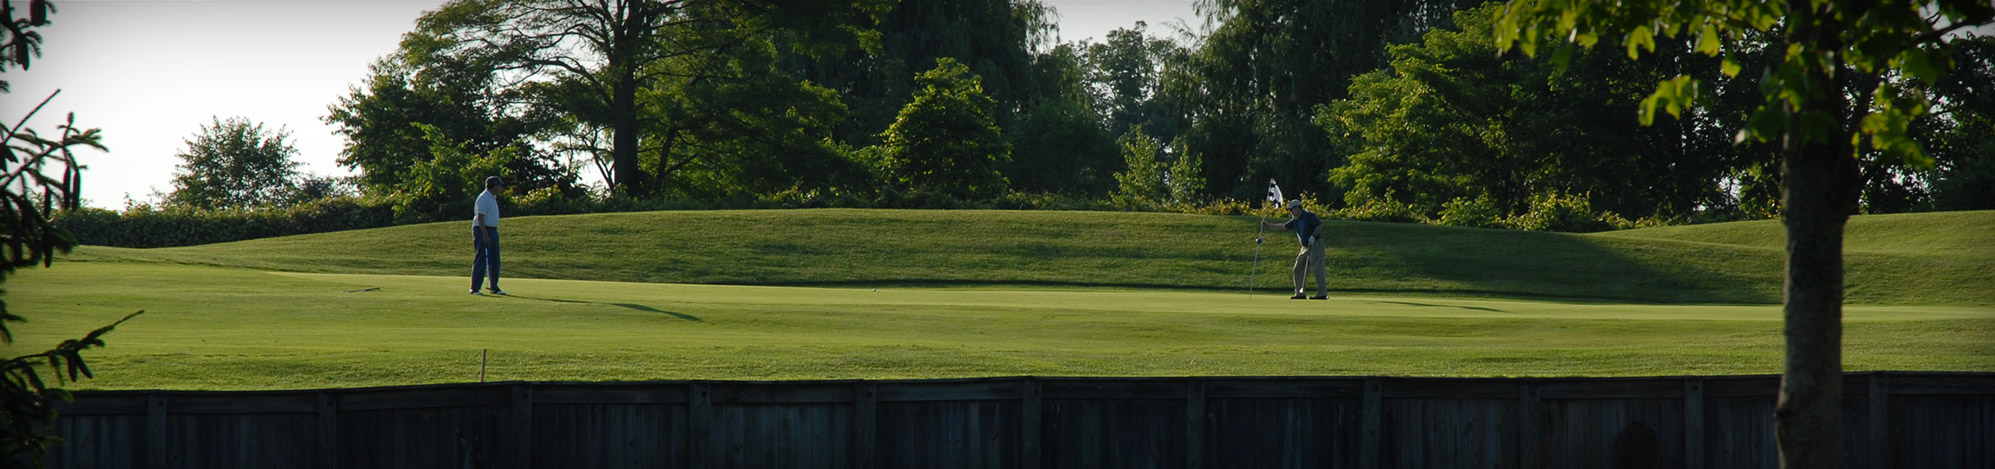 The Bridges Golf Club Abbottstown Pa